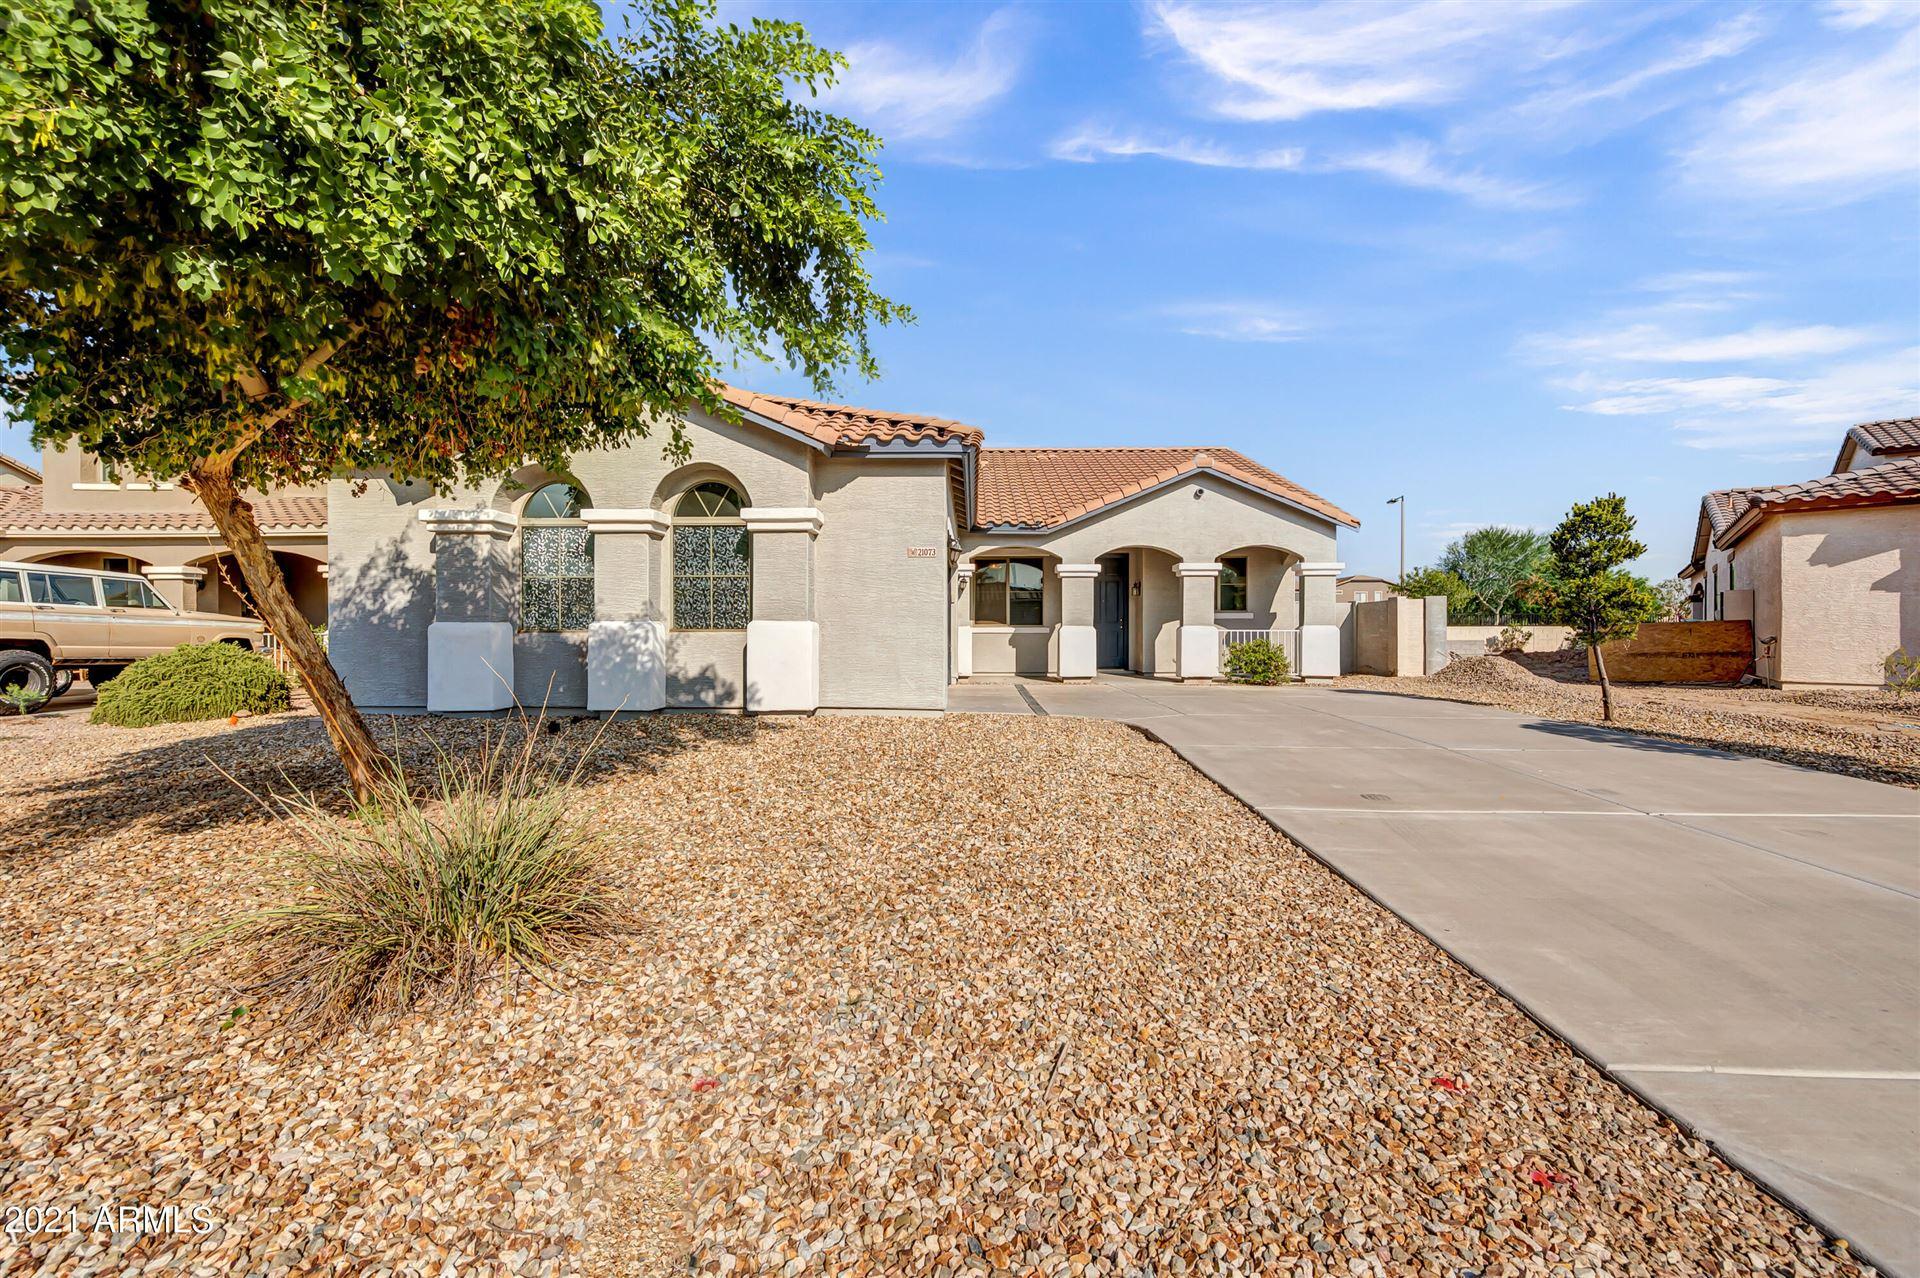 Photo of 21073 S 214th Place, Queen Creek, AZ 85142 (MLS # 6294966)